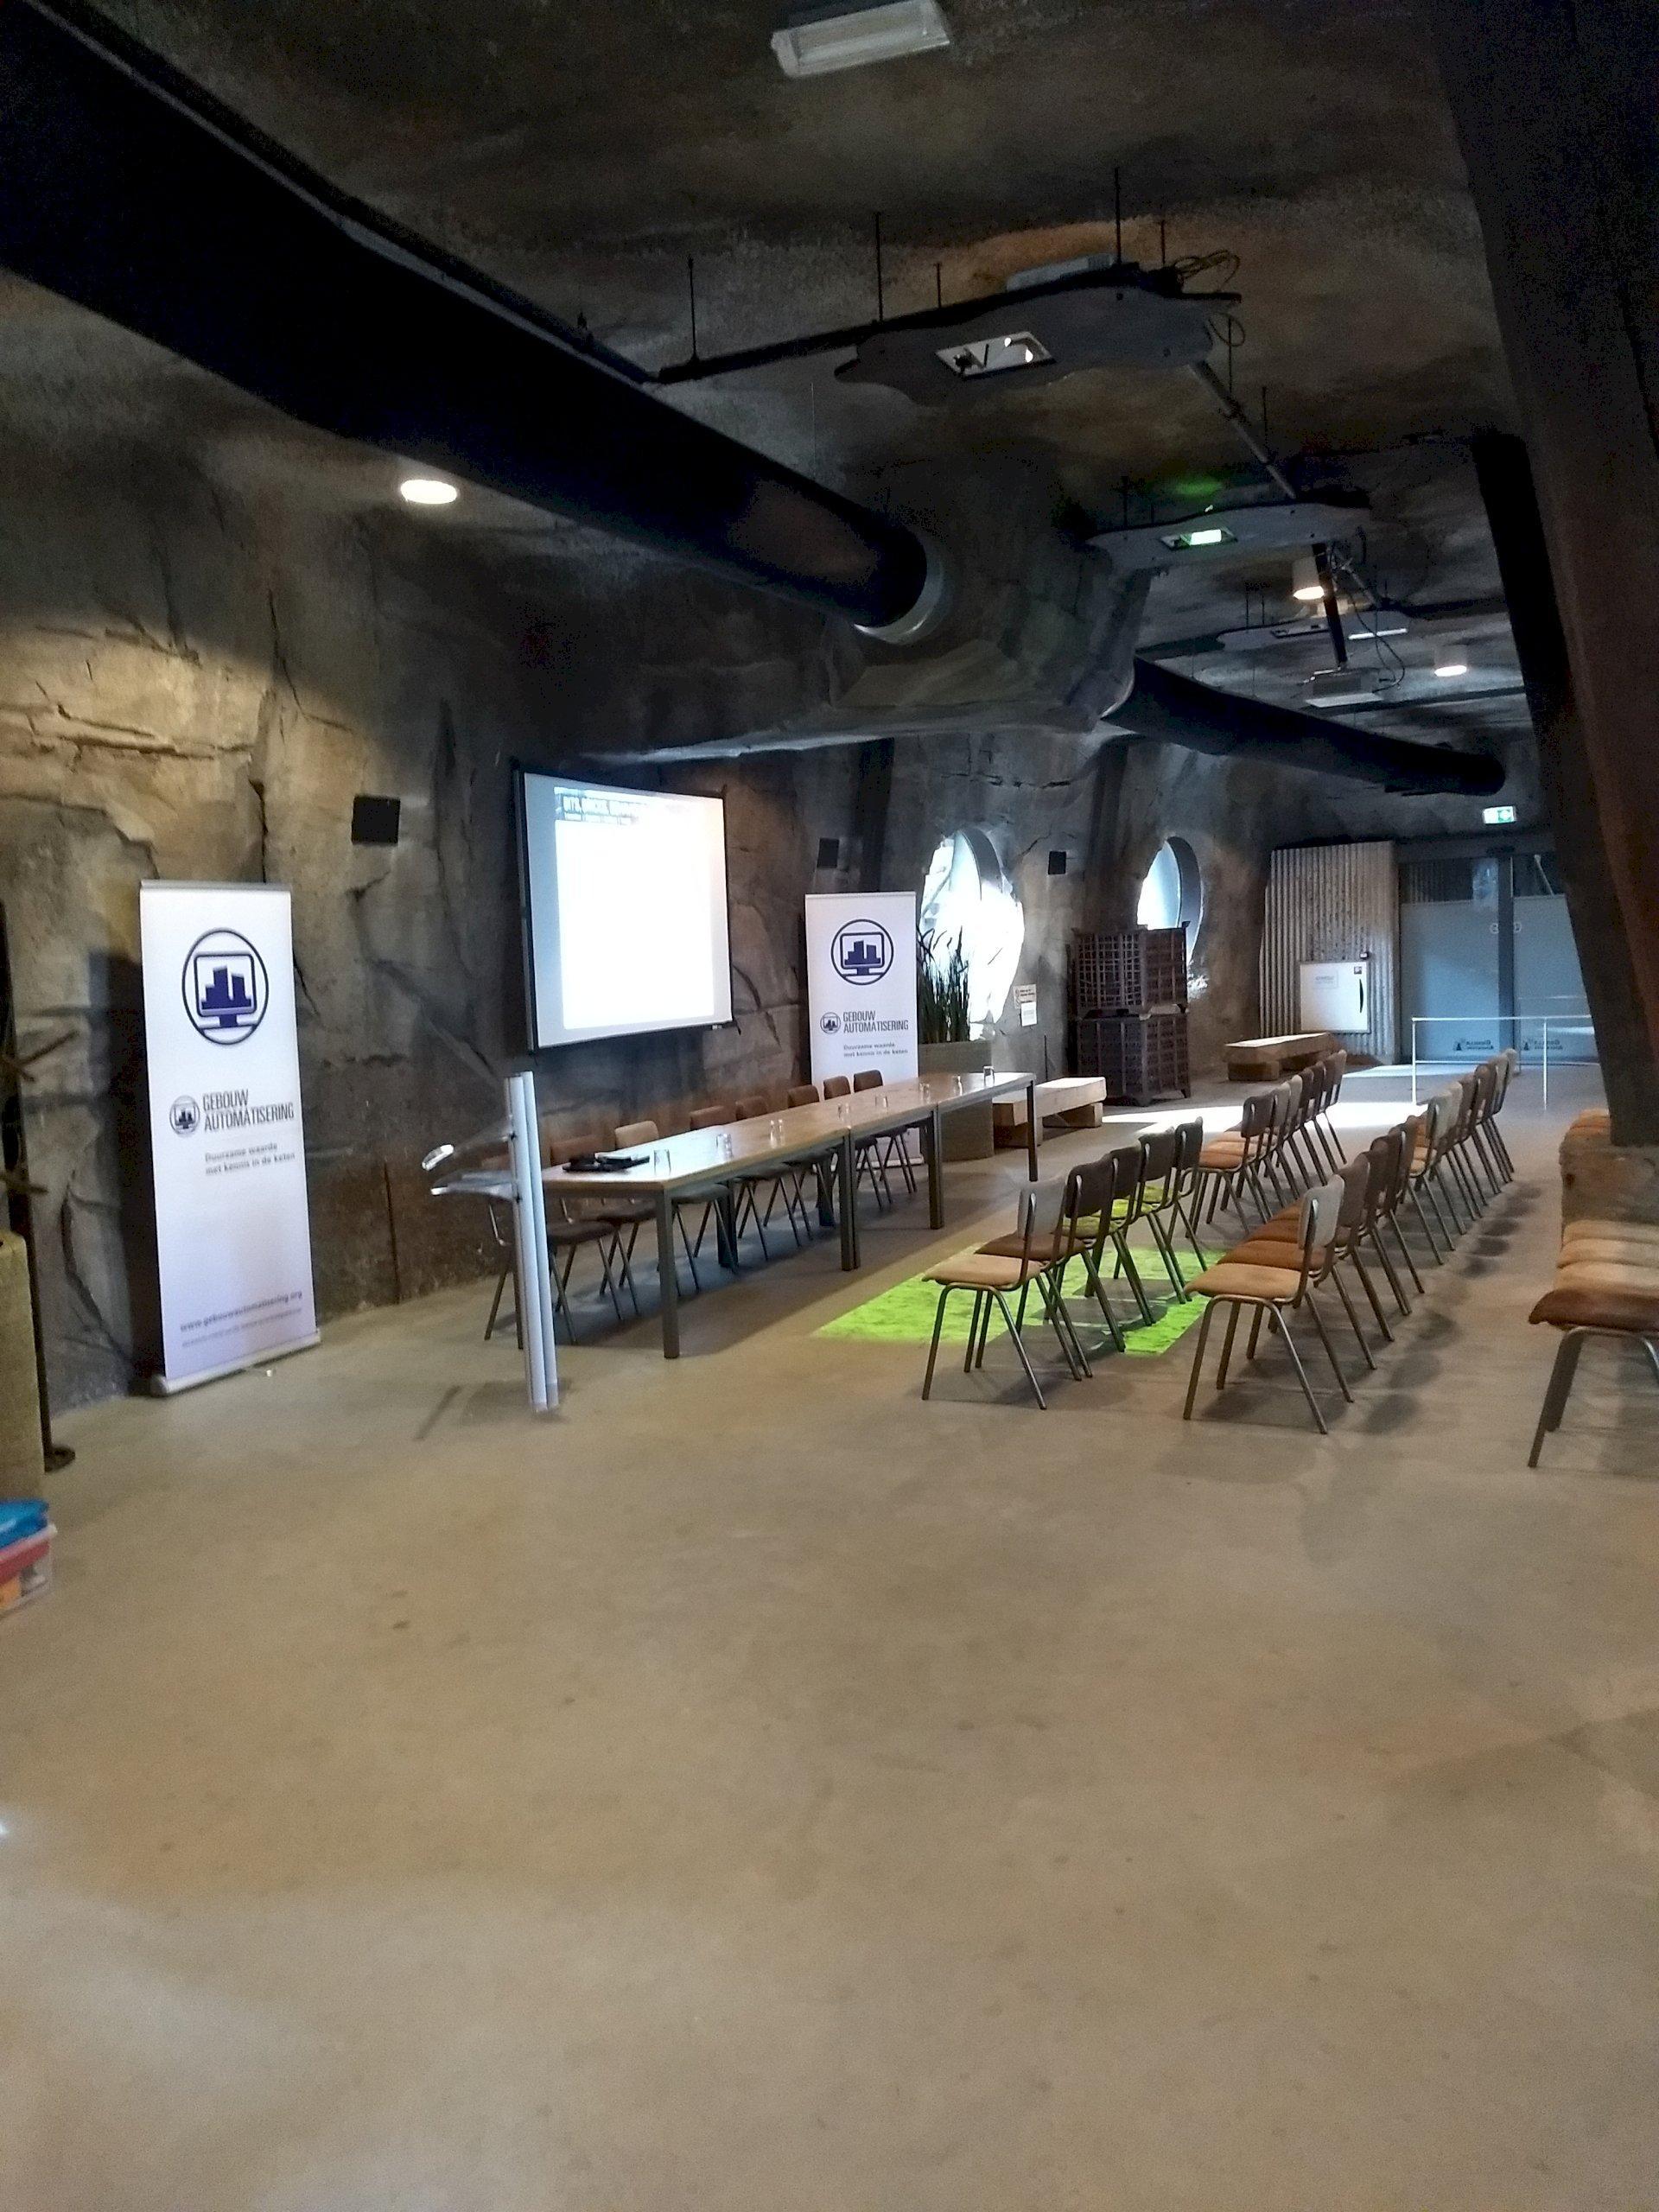 Terugblik Algemene Ledenvergadering branche Gebouw Automatisering en Kick-off Bits, Bricks & Behaviour